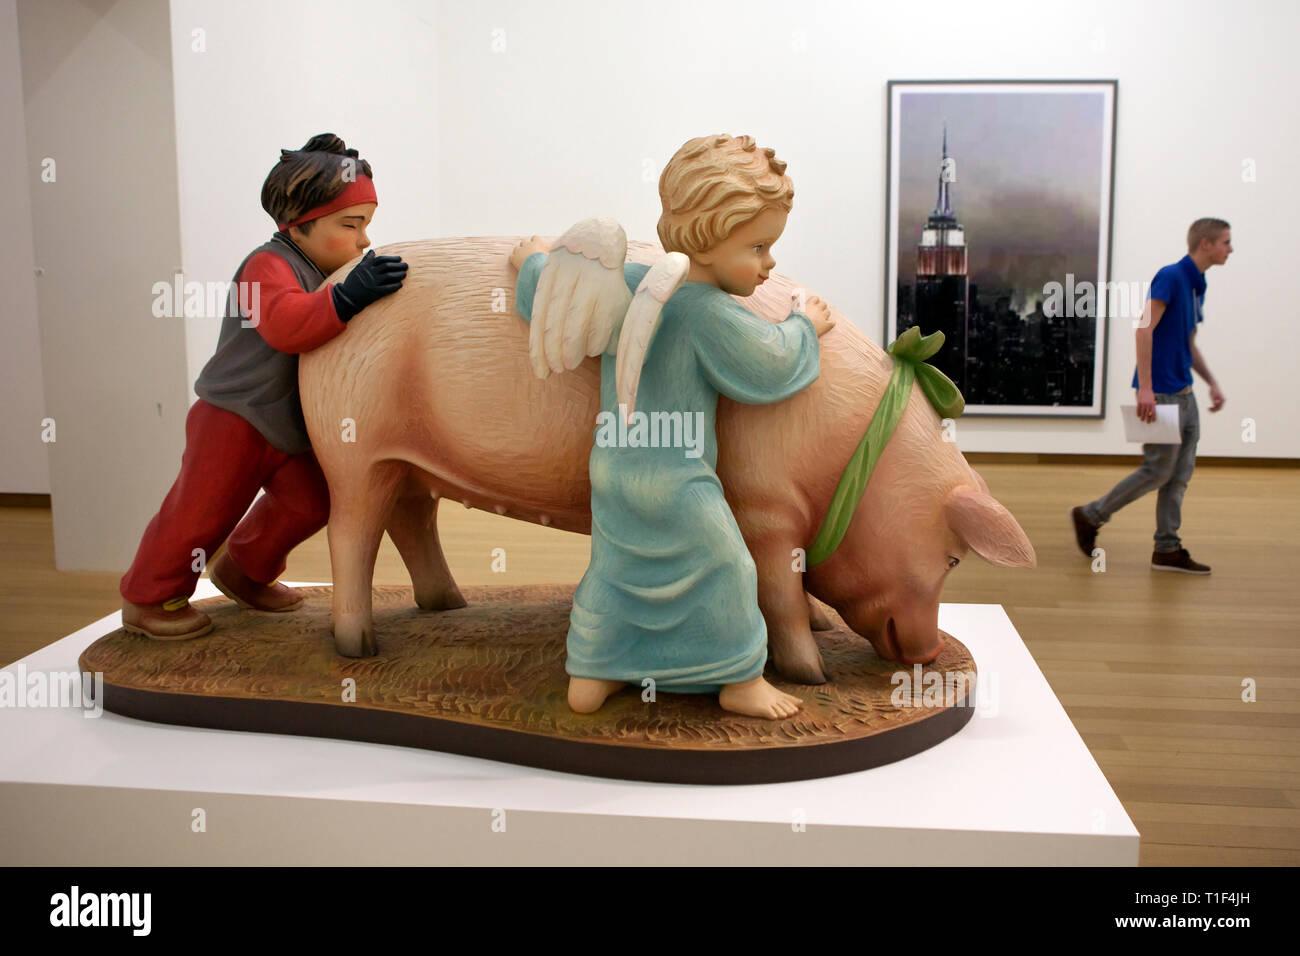 AMSTERDAM - Jeff Koons sculpture entitled: 'Ushering in Banality' in the Stedelijk Museum. - Stock Image